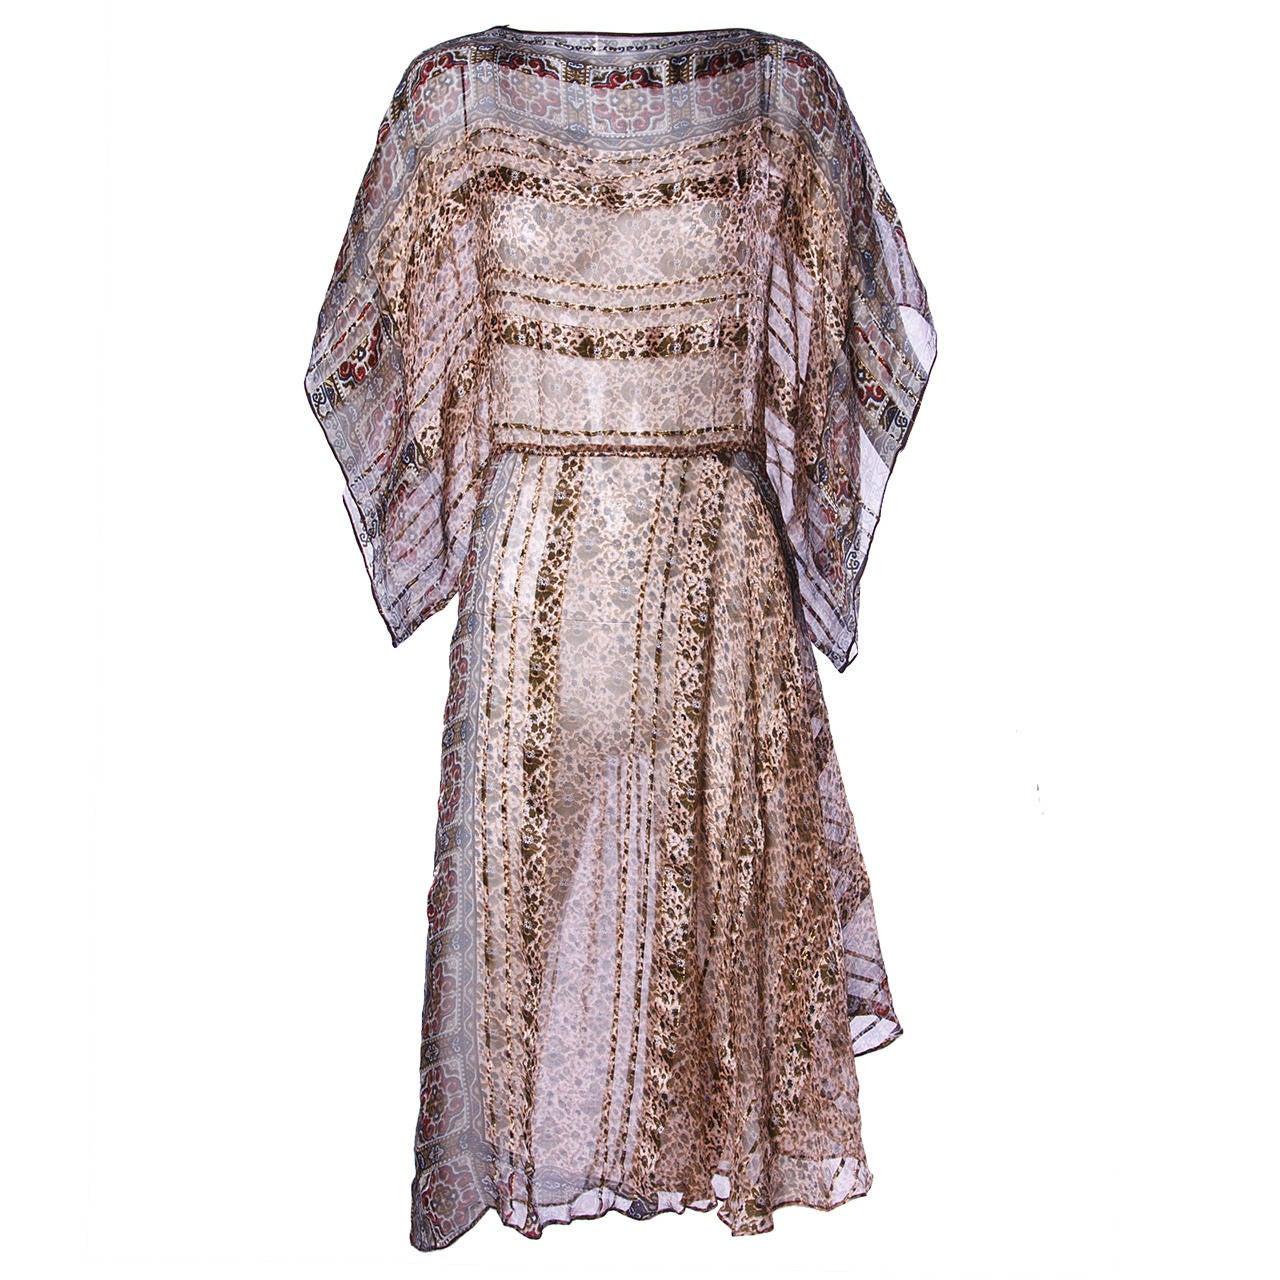 Vintage 1970s Sheer Silk Chiffon India Print Dress with Kimono Sleeves 1